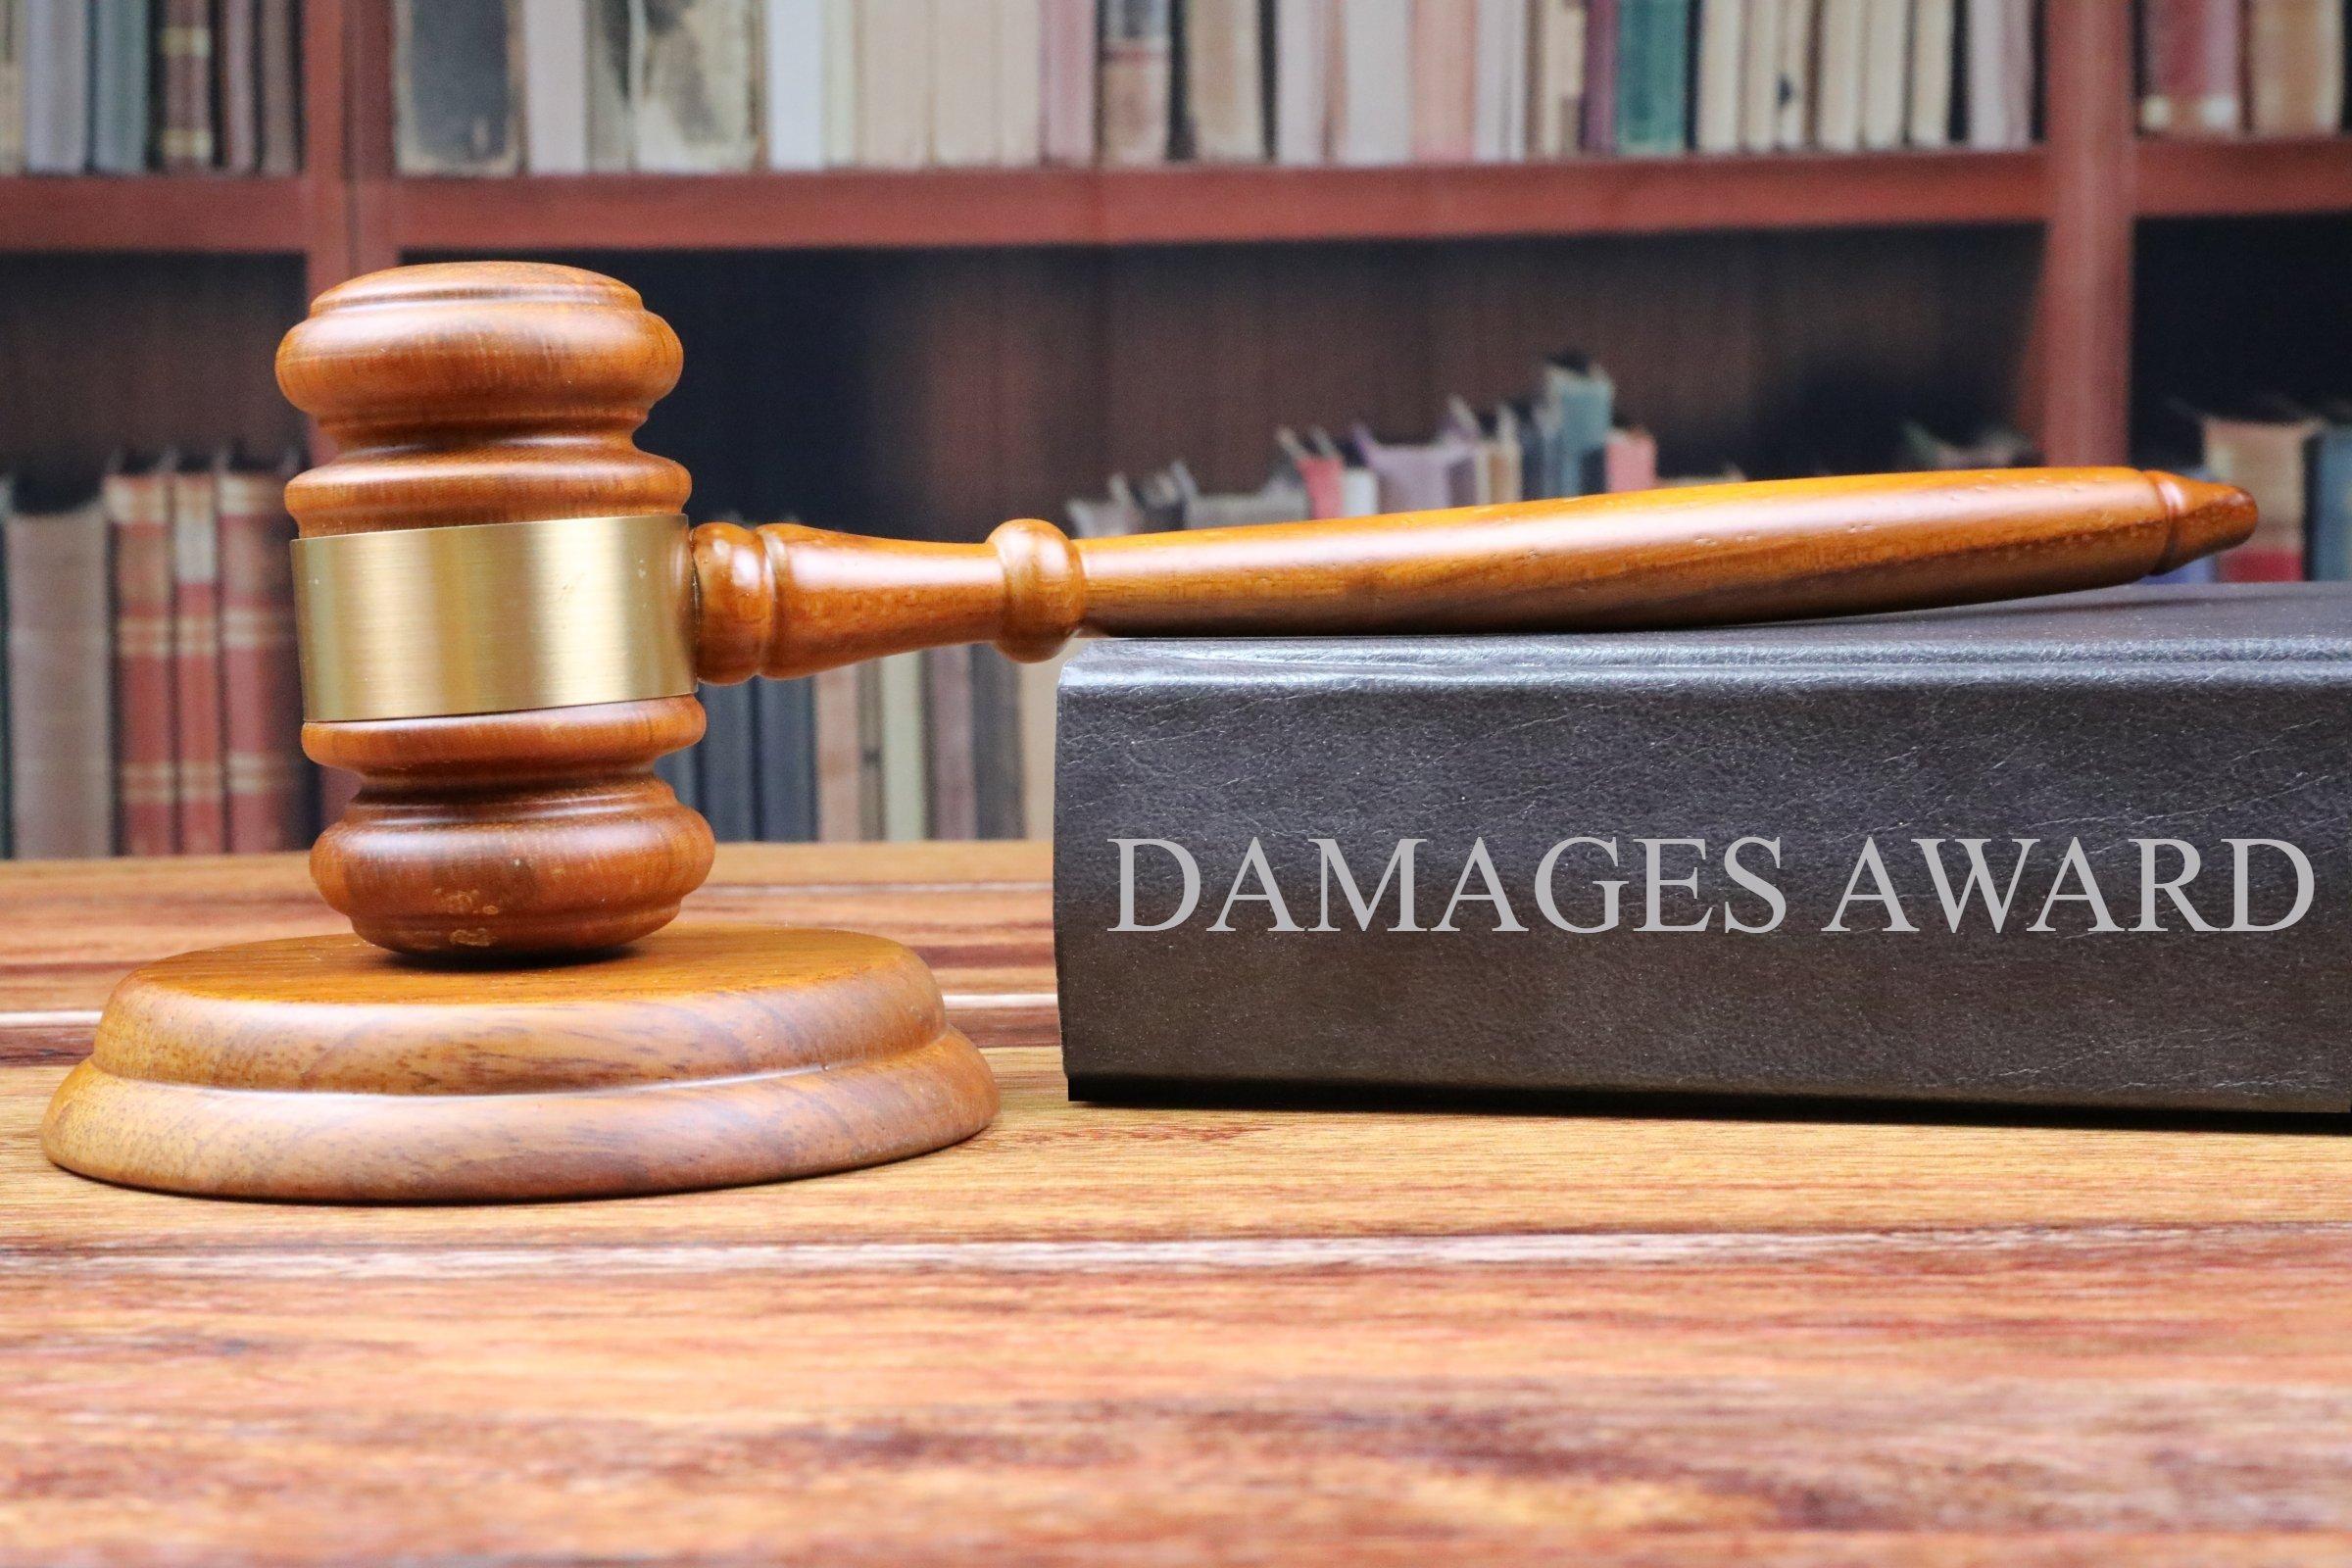 Damages Award